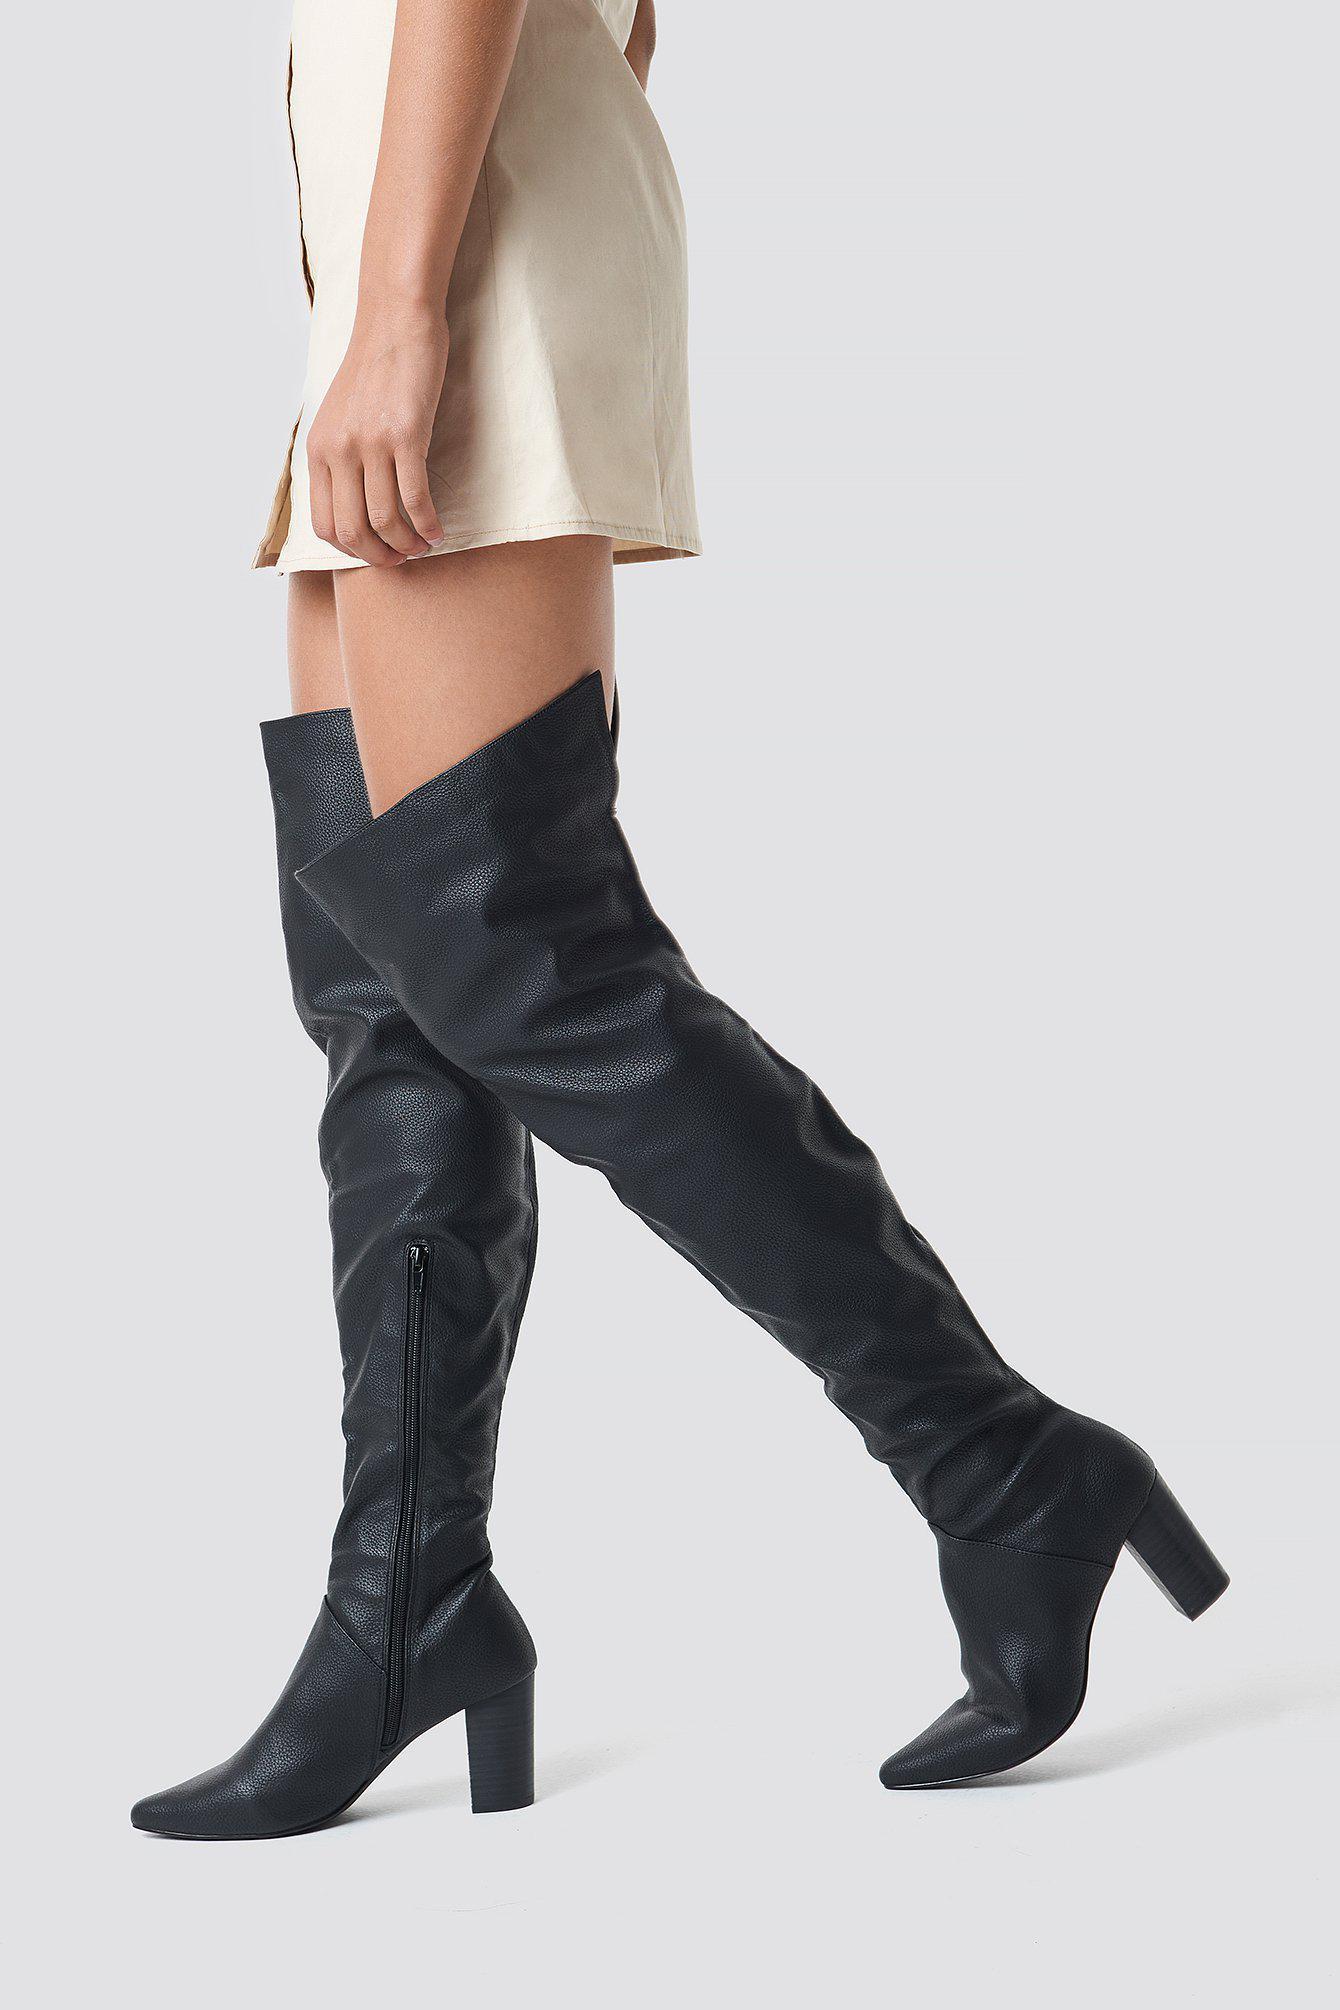 brand new 95fd8 9012a NA-KD. Women s Classic Overknee Boots Black